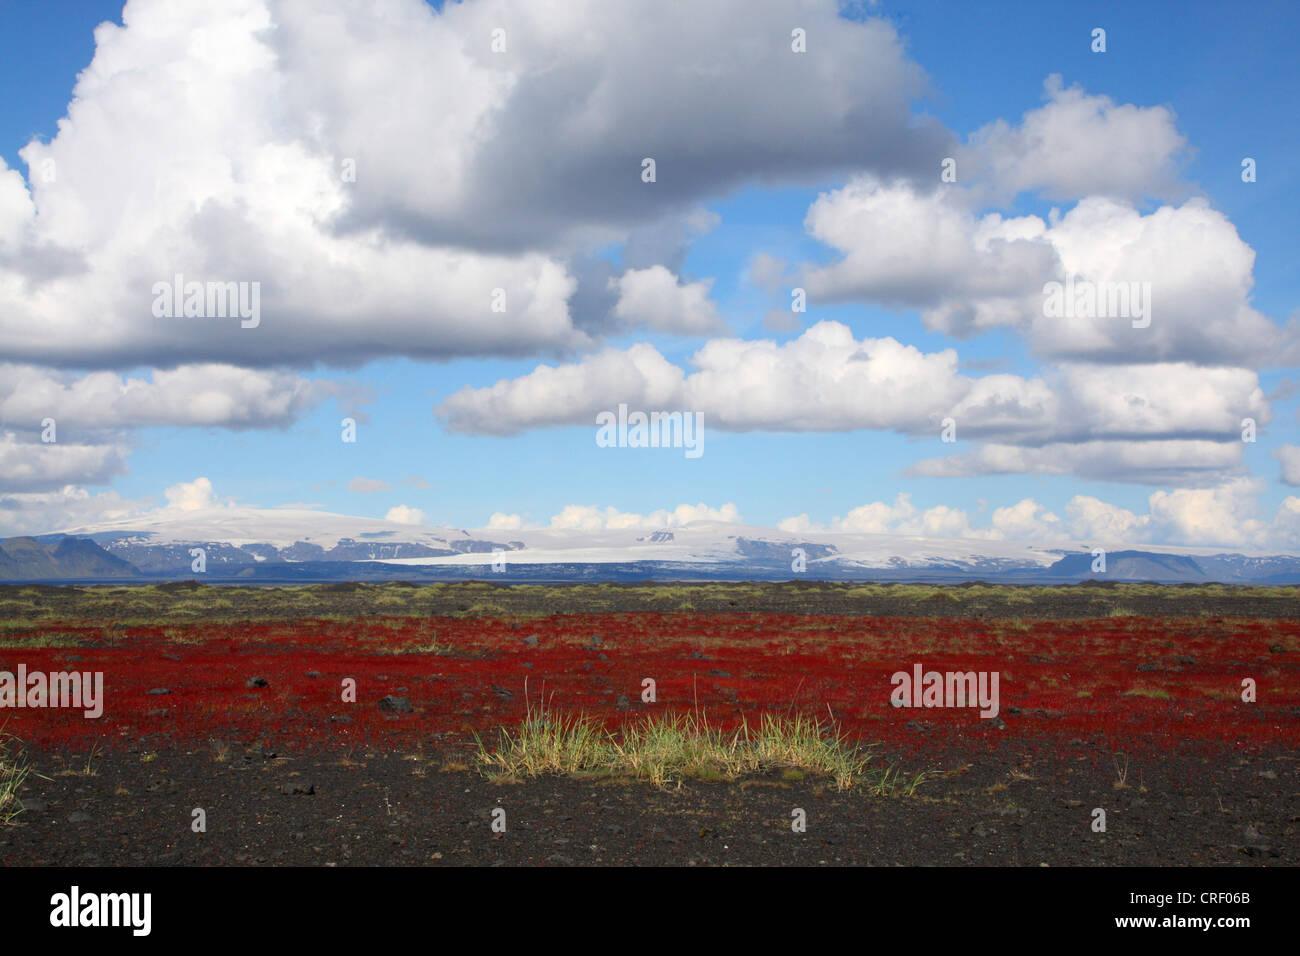 landscape on Iceland with rumex, Iceland Stock Photo